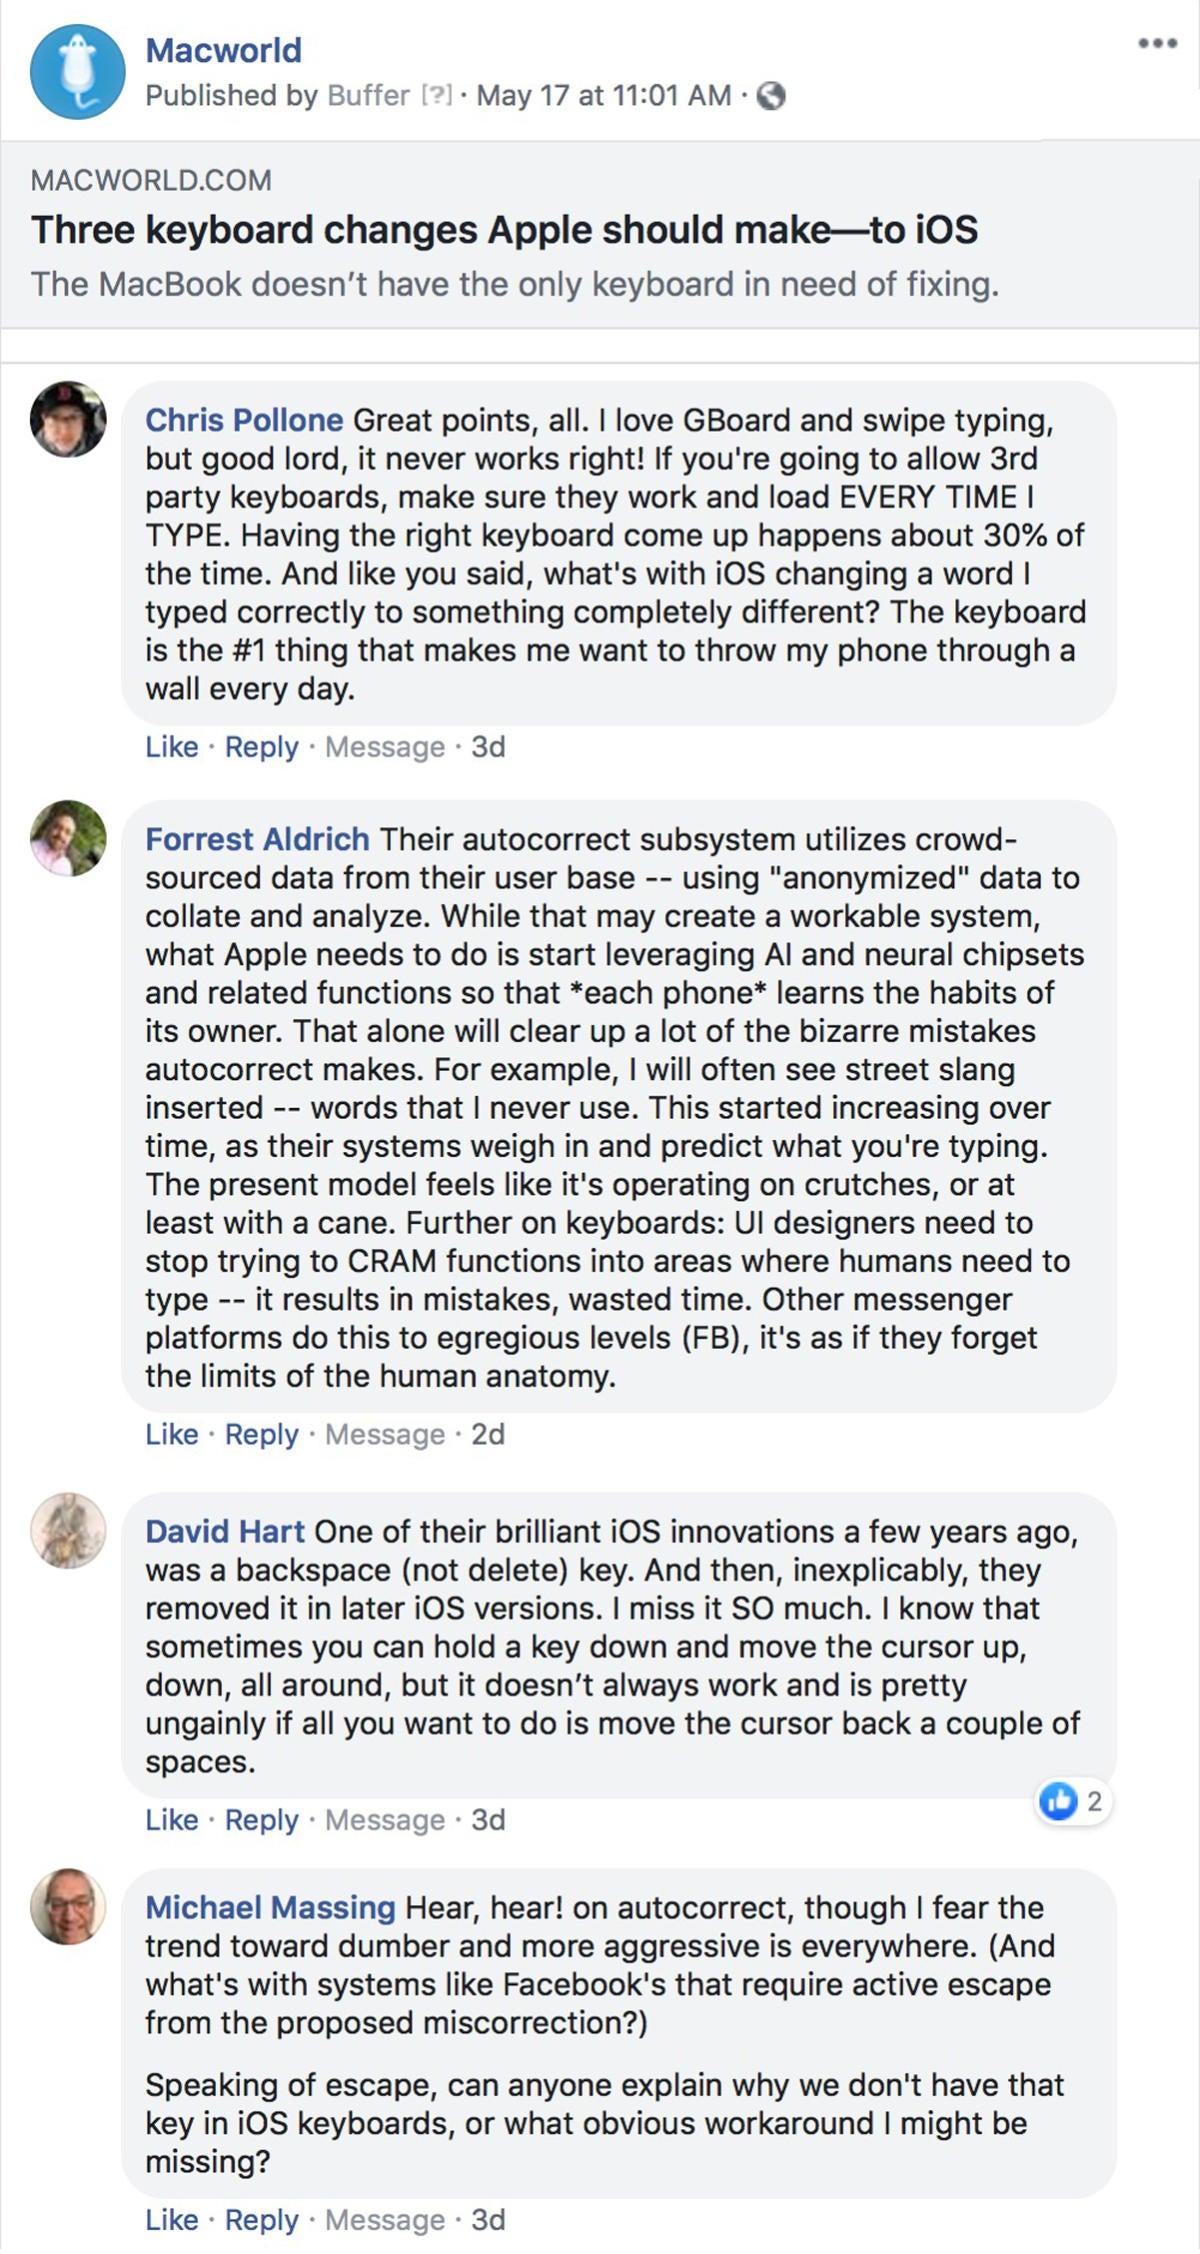 macworld podcast 652 ios keyboard facebook